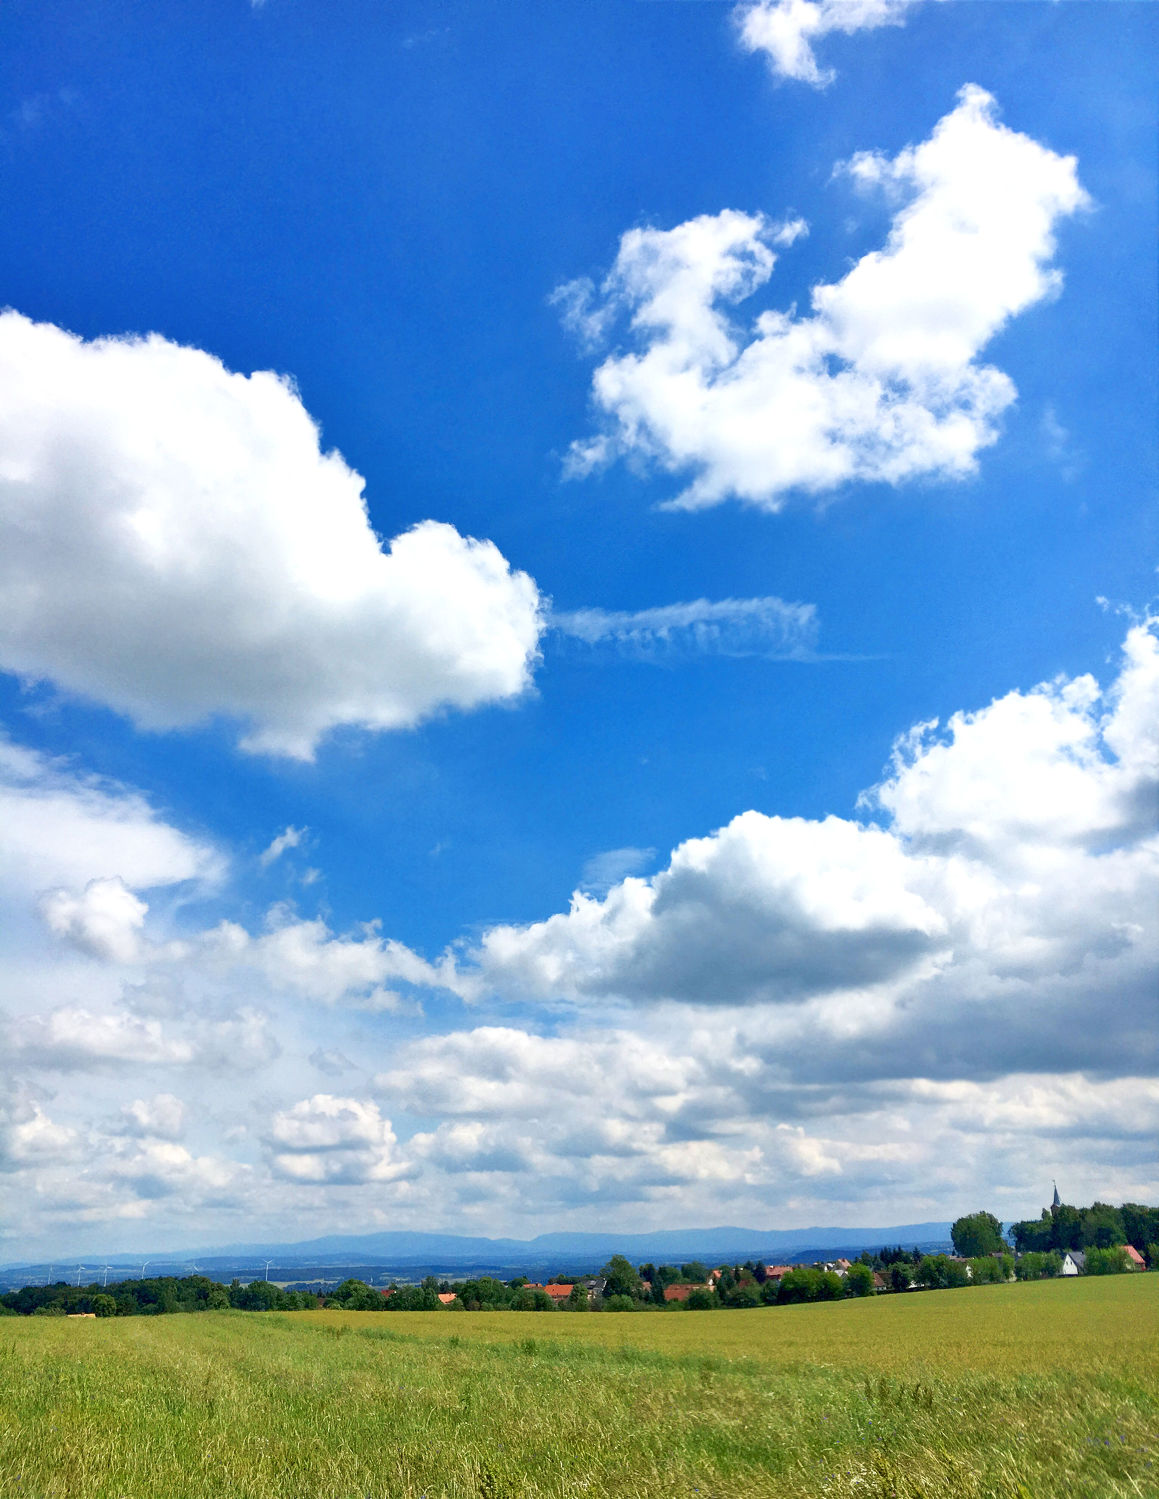 Bild mit Natur, Wolken, Blau, Wolkenhimmel, Landschaft, Sky, Wolken am Himmel, Himmel Panorama, Wolkenhimmel Panorama, Weitblick, Wolken Himmel, cloud, clouds, Feld, Feldblick